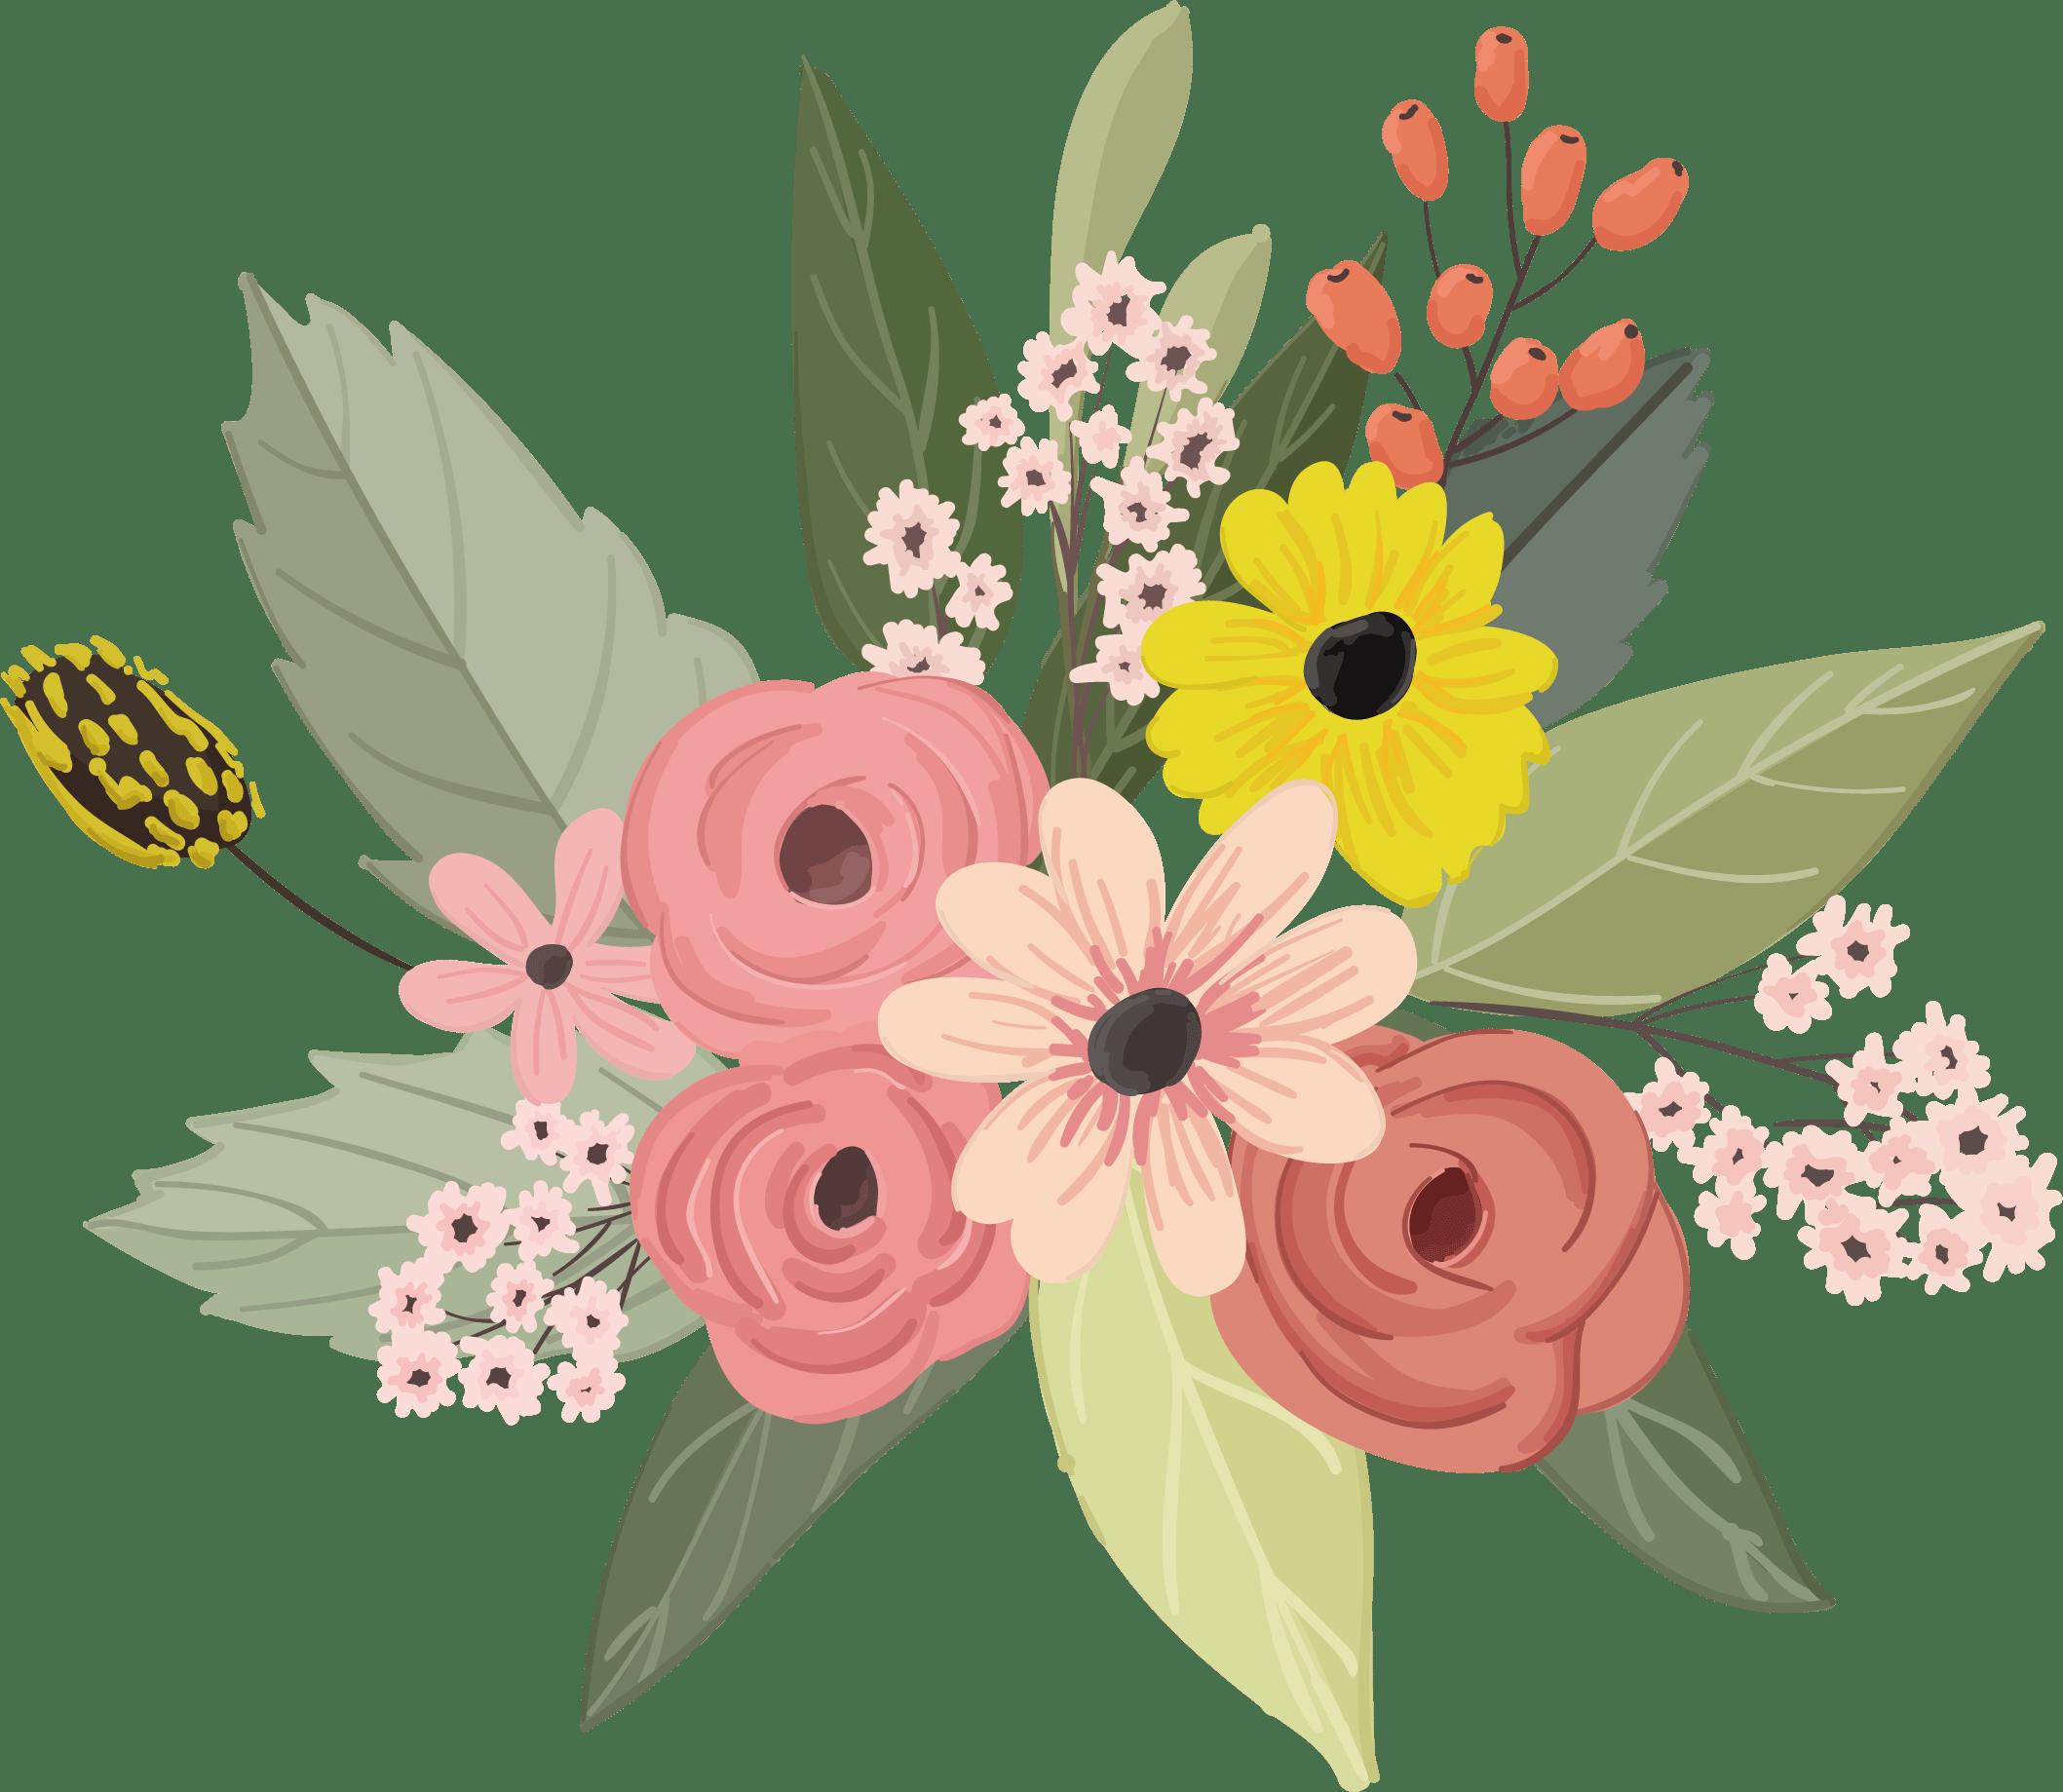 flower floral design watercolor